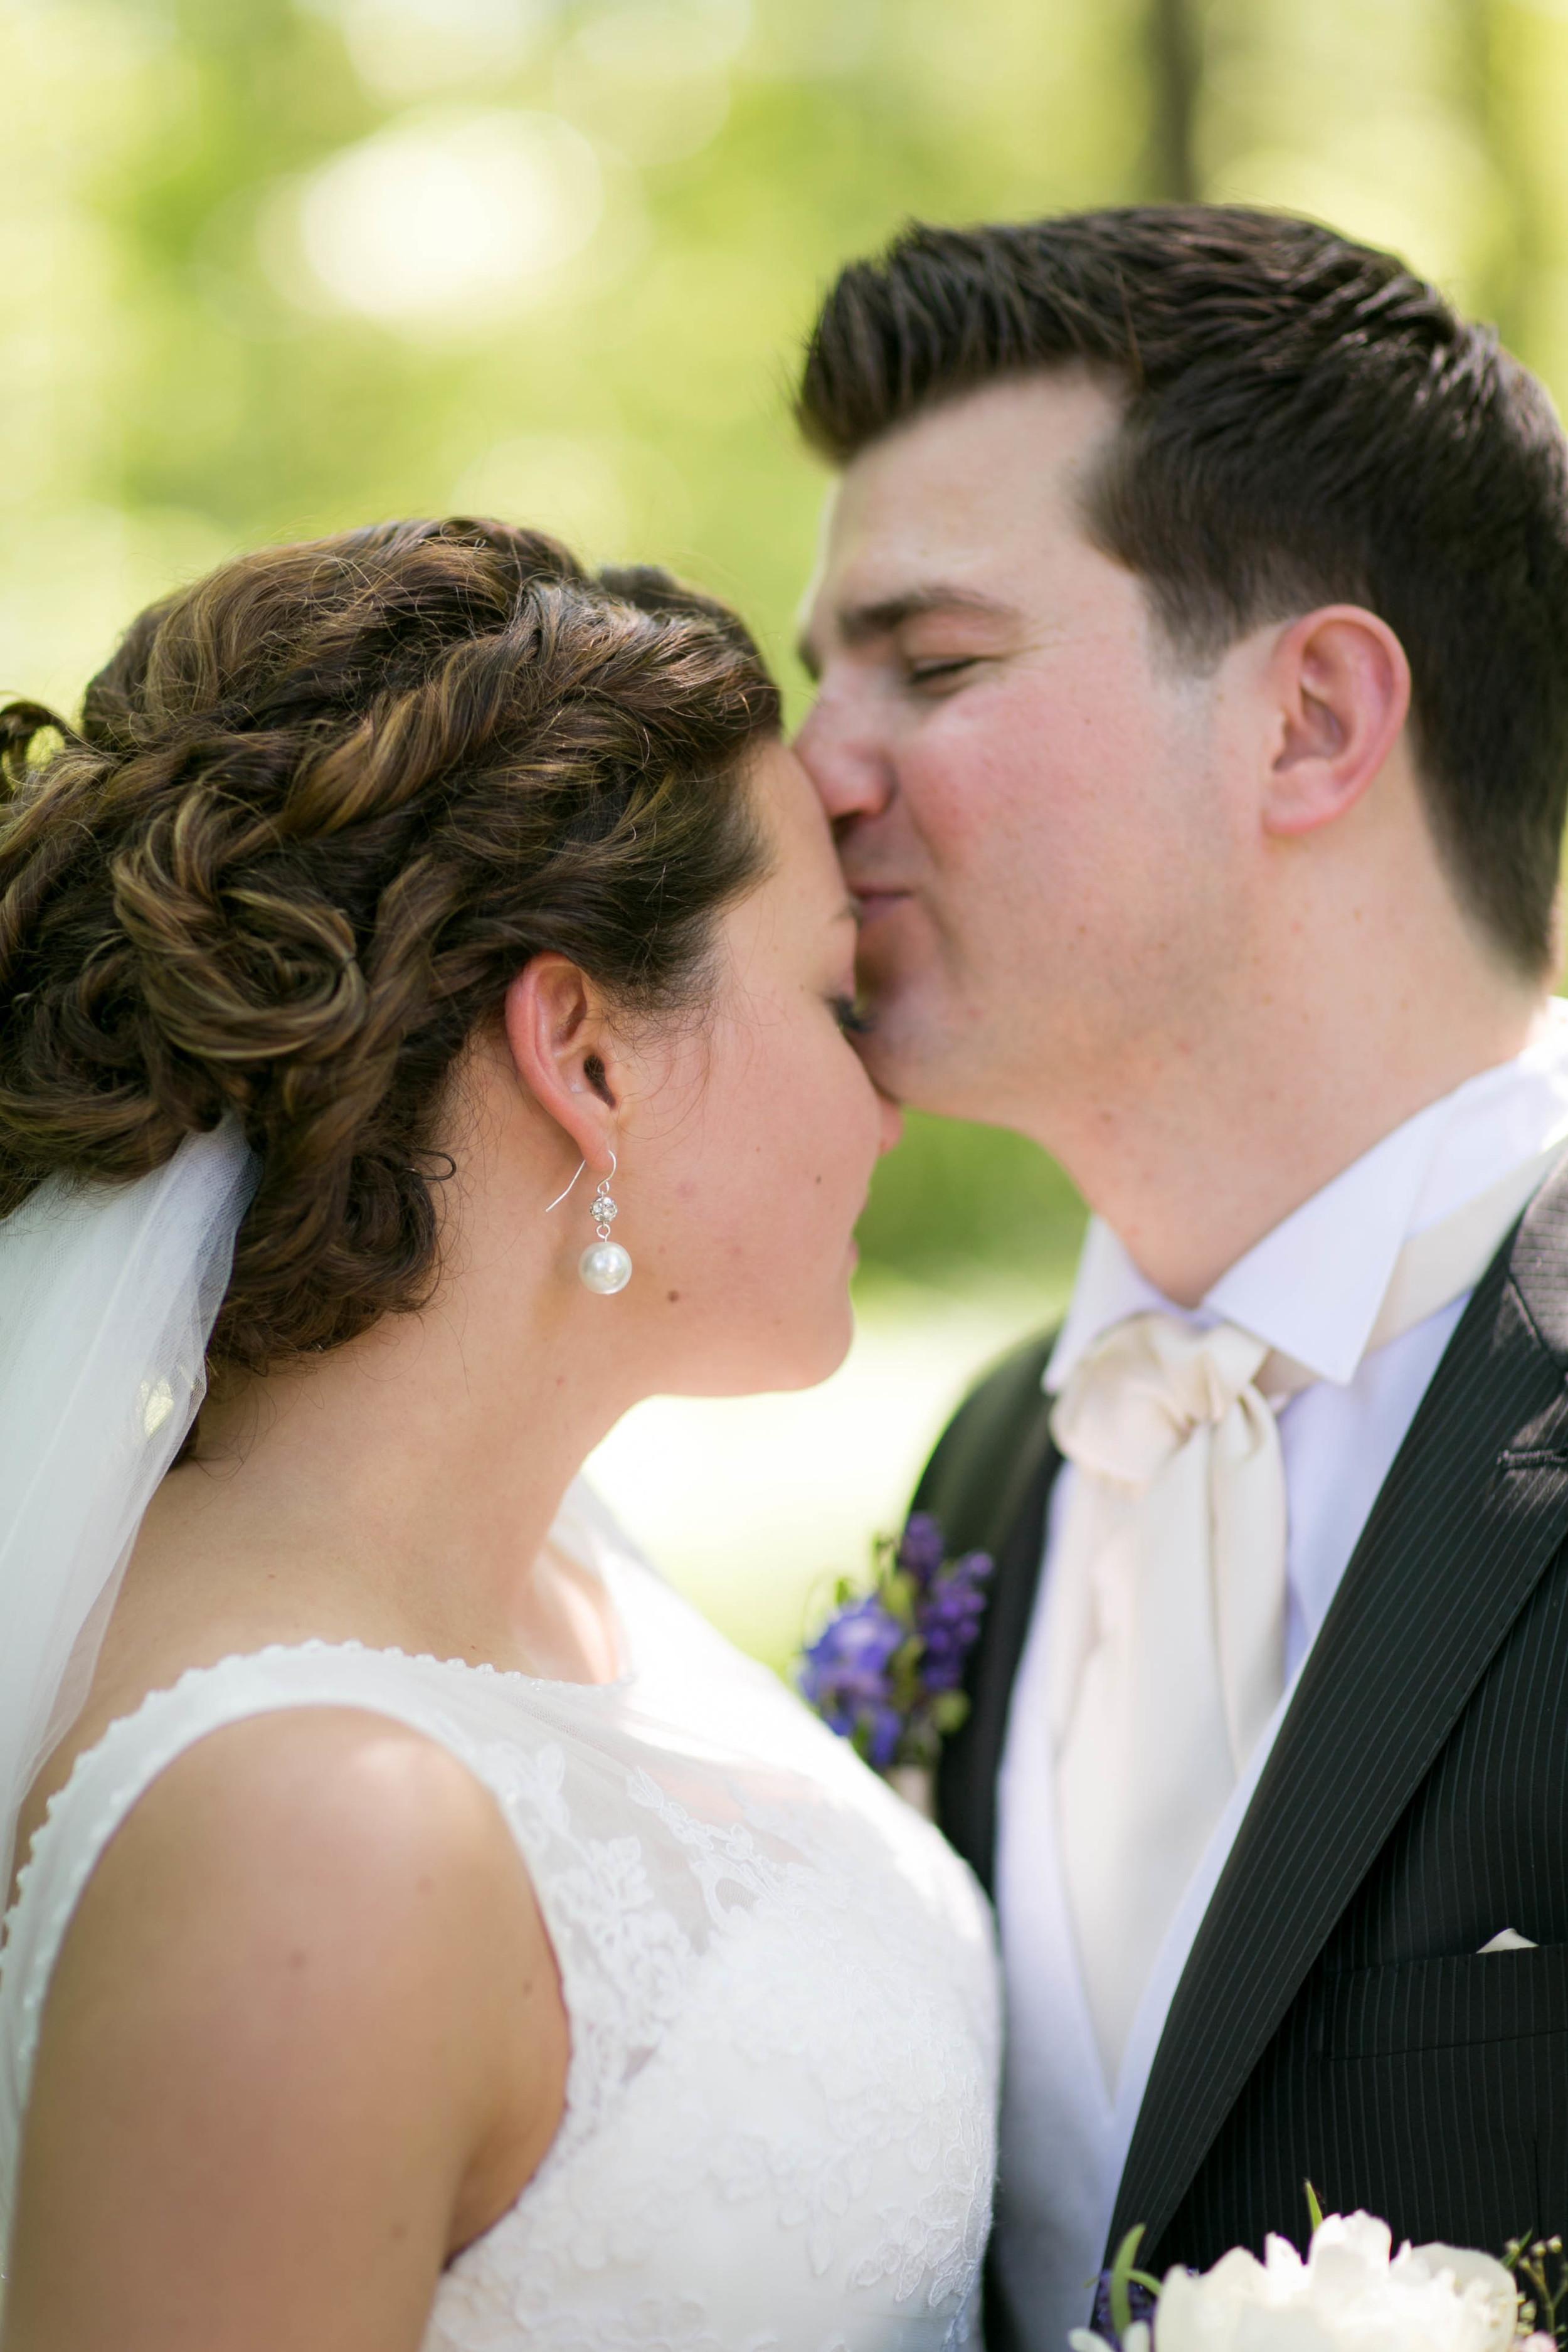 Hochzeitsfotografie Berlin_Fran Burrows Fotografie-189.jpg